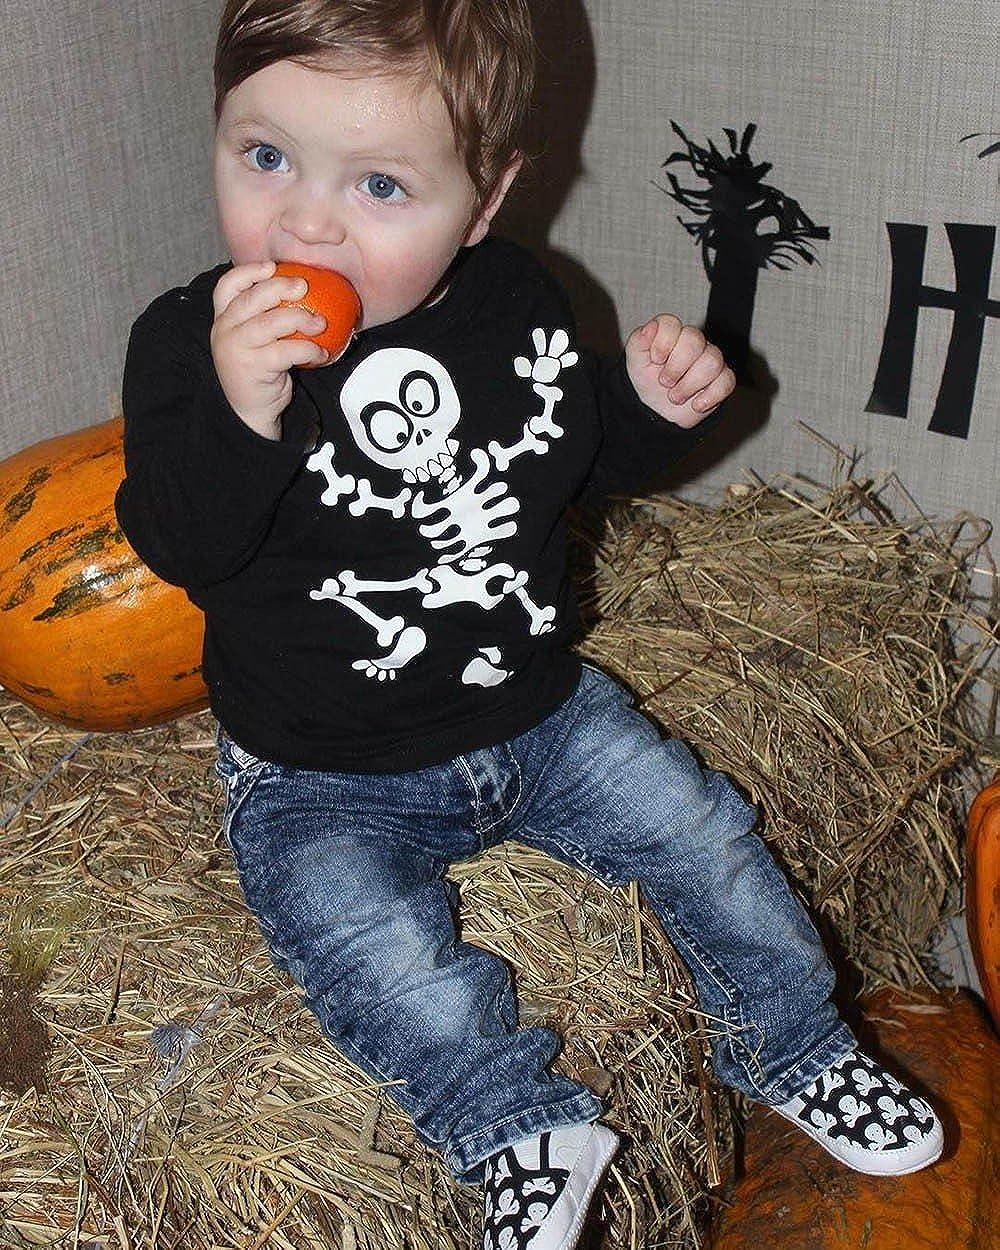 Toddler Halloween Clothing Boys,MONsin Halloween Toddler Little Girls Boys Clothes Bone Print T-Shirt Tops Pants